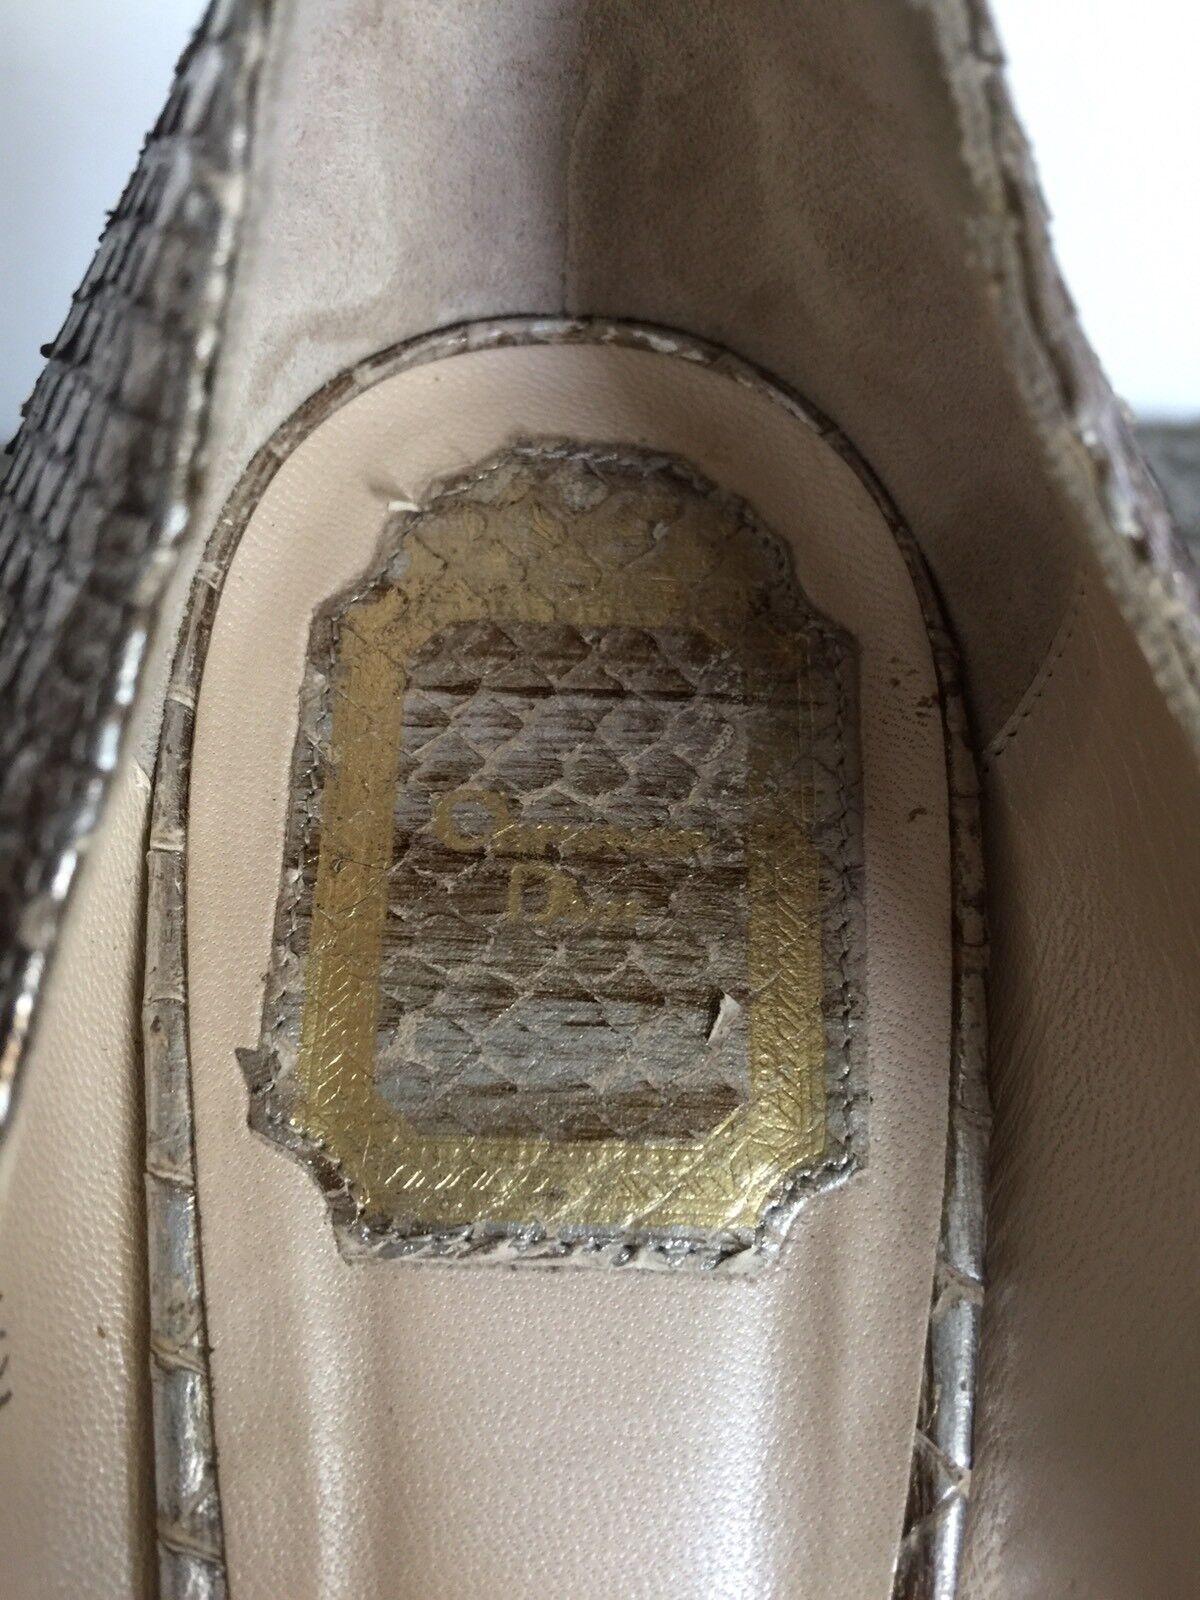 Auth. Silber Christian Dior Miss Dior Snake Skin Gold Silber Auth. Platform Pumps Heels, 40 0bd960